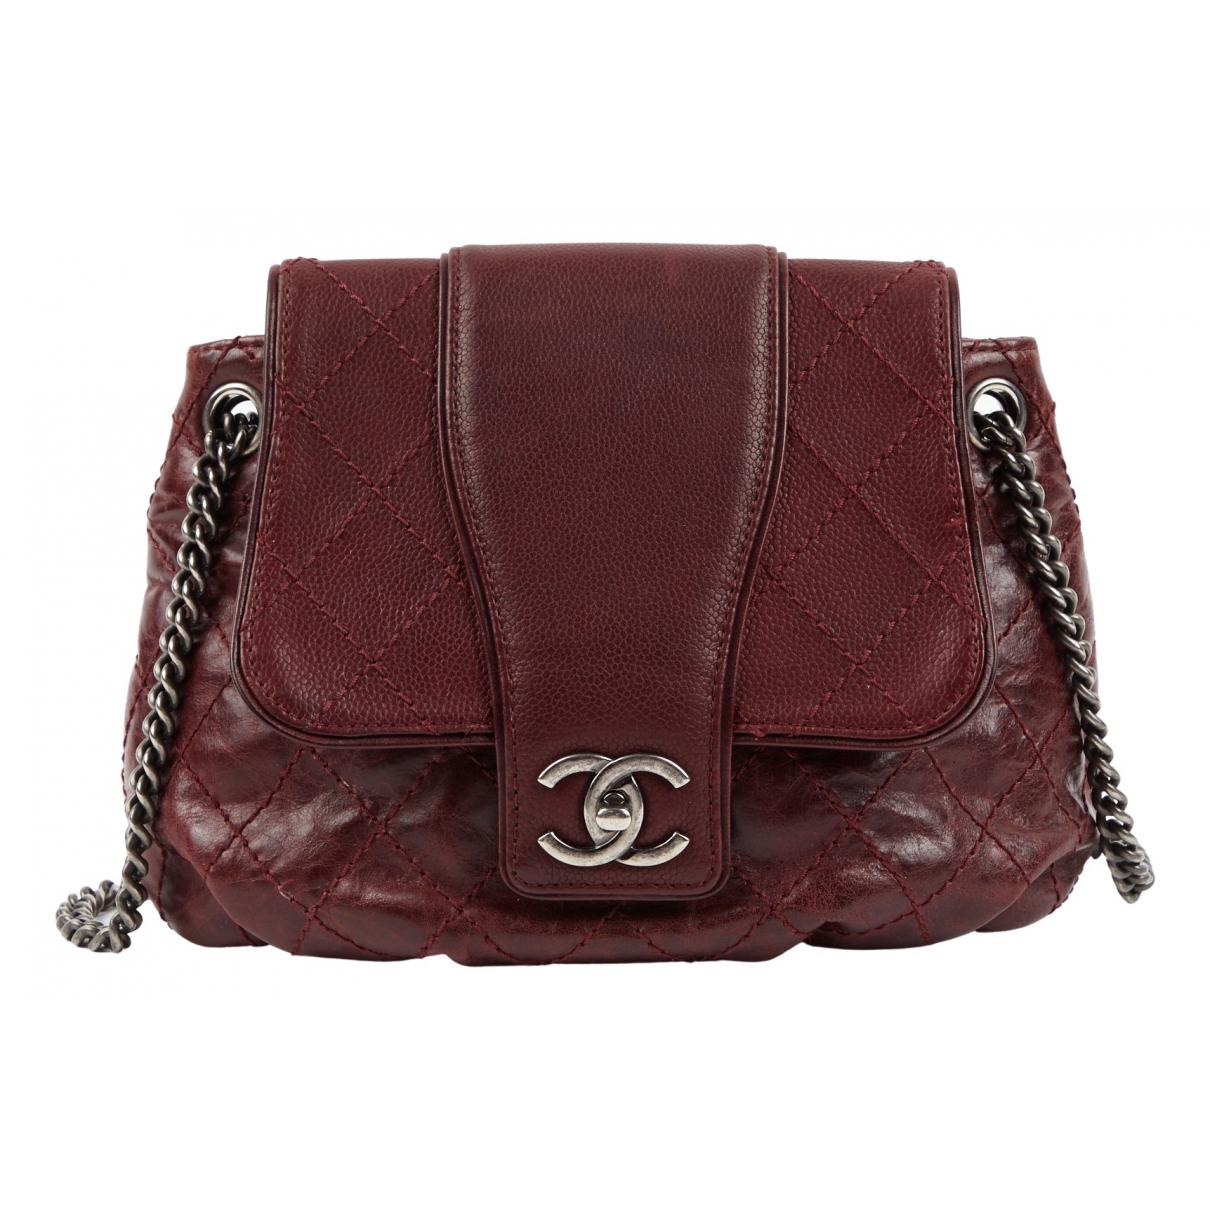 Chanel \N Burgundy Leather handbag for Women \N